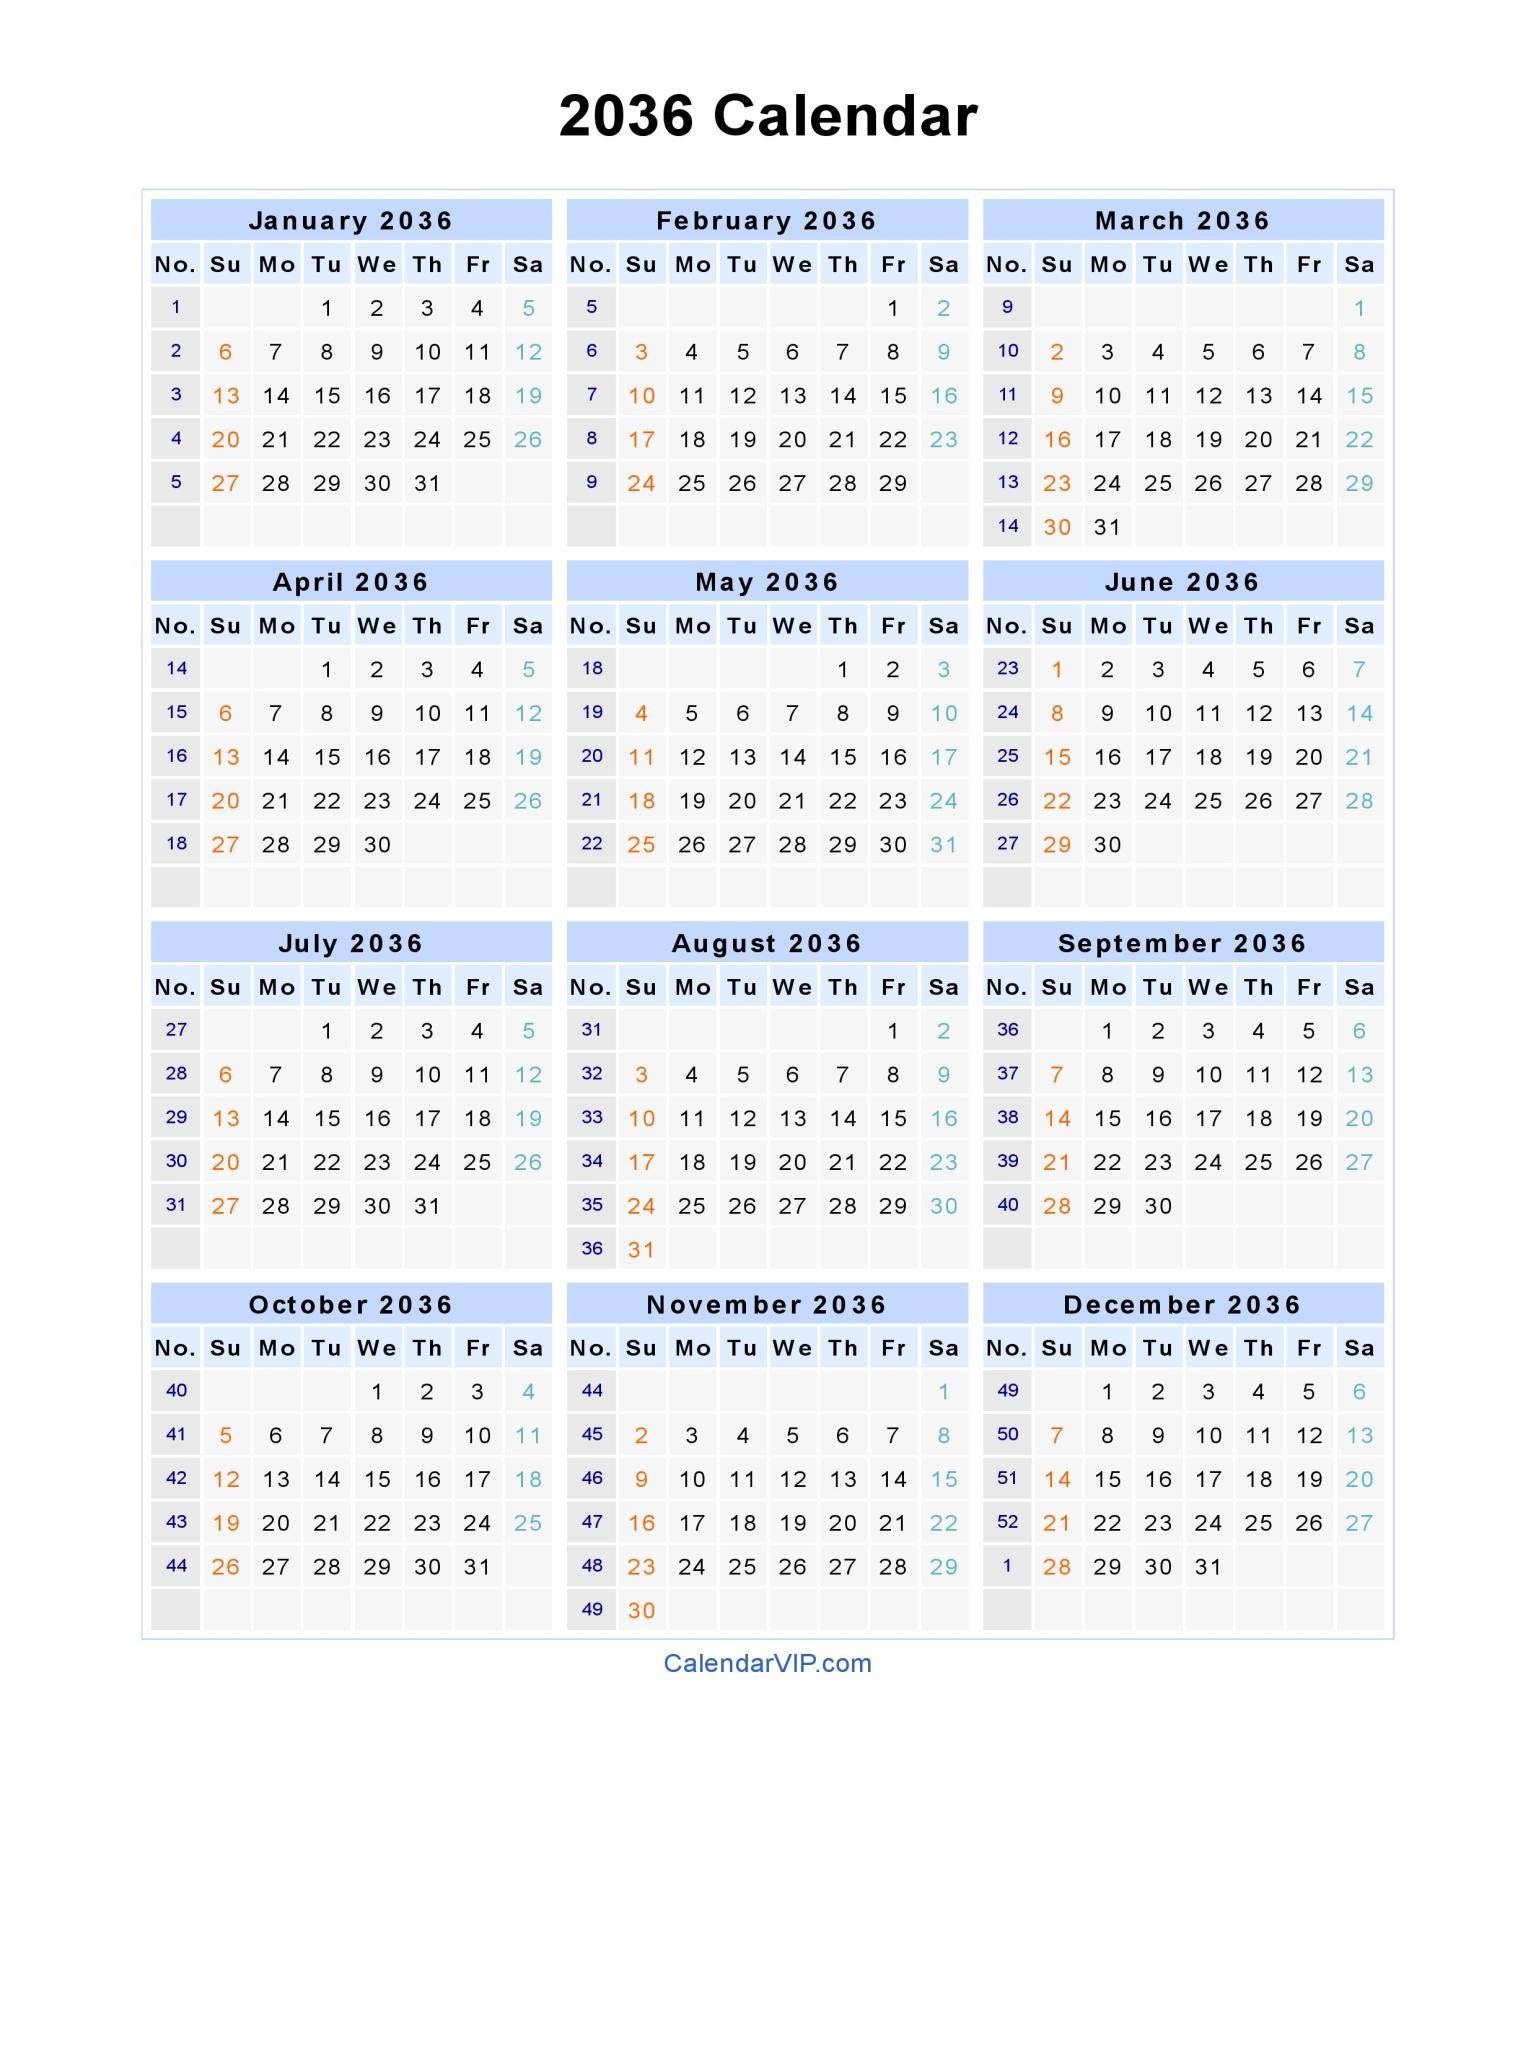 2036 calendar